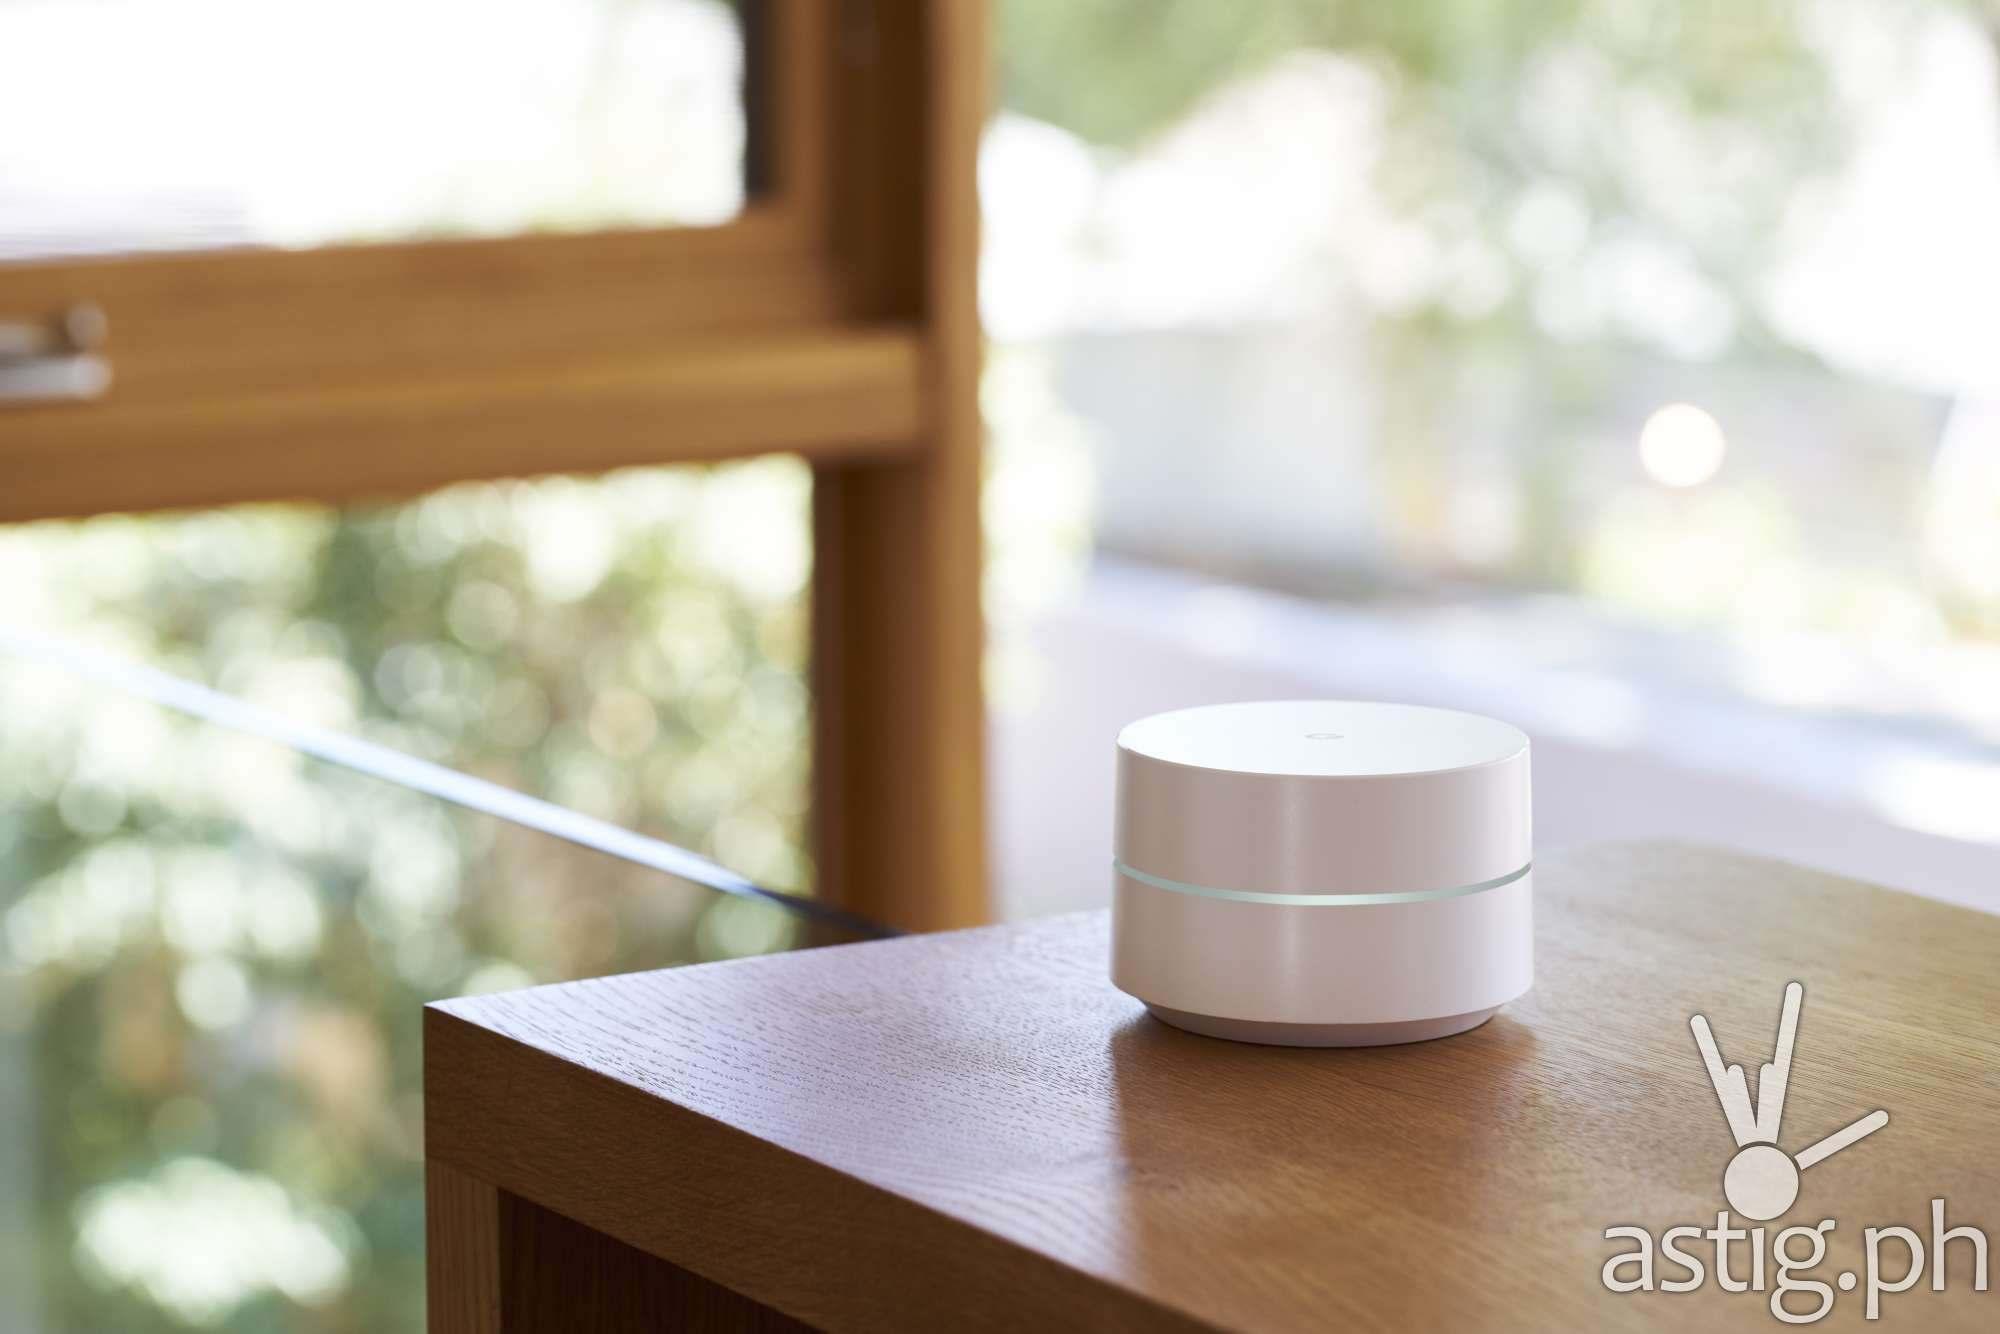 PLDT Home Google Wifi Plan